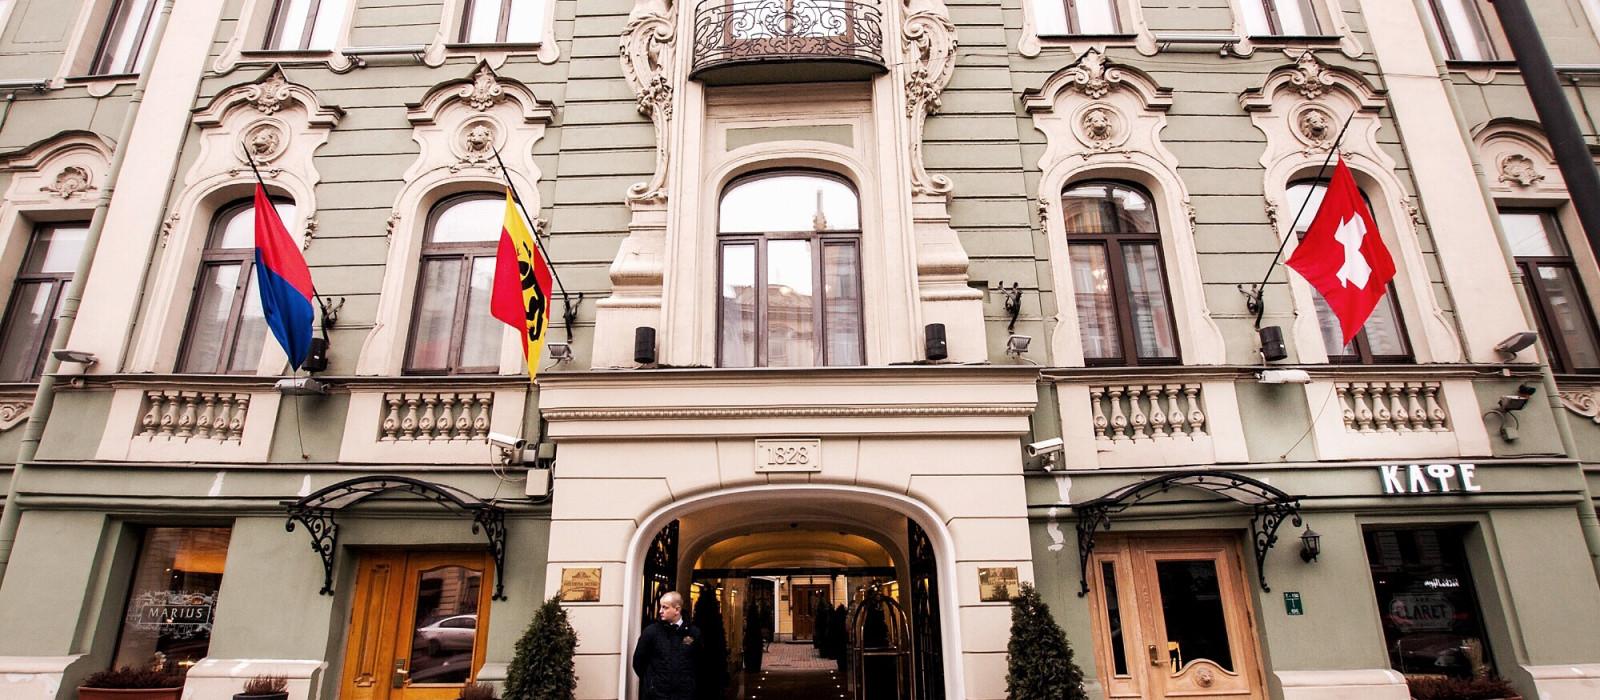 Hotel Helvetia  Russia